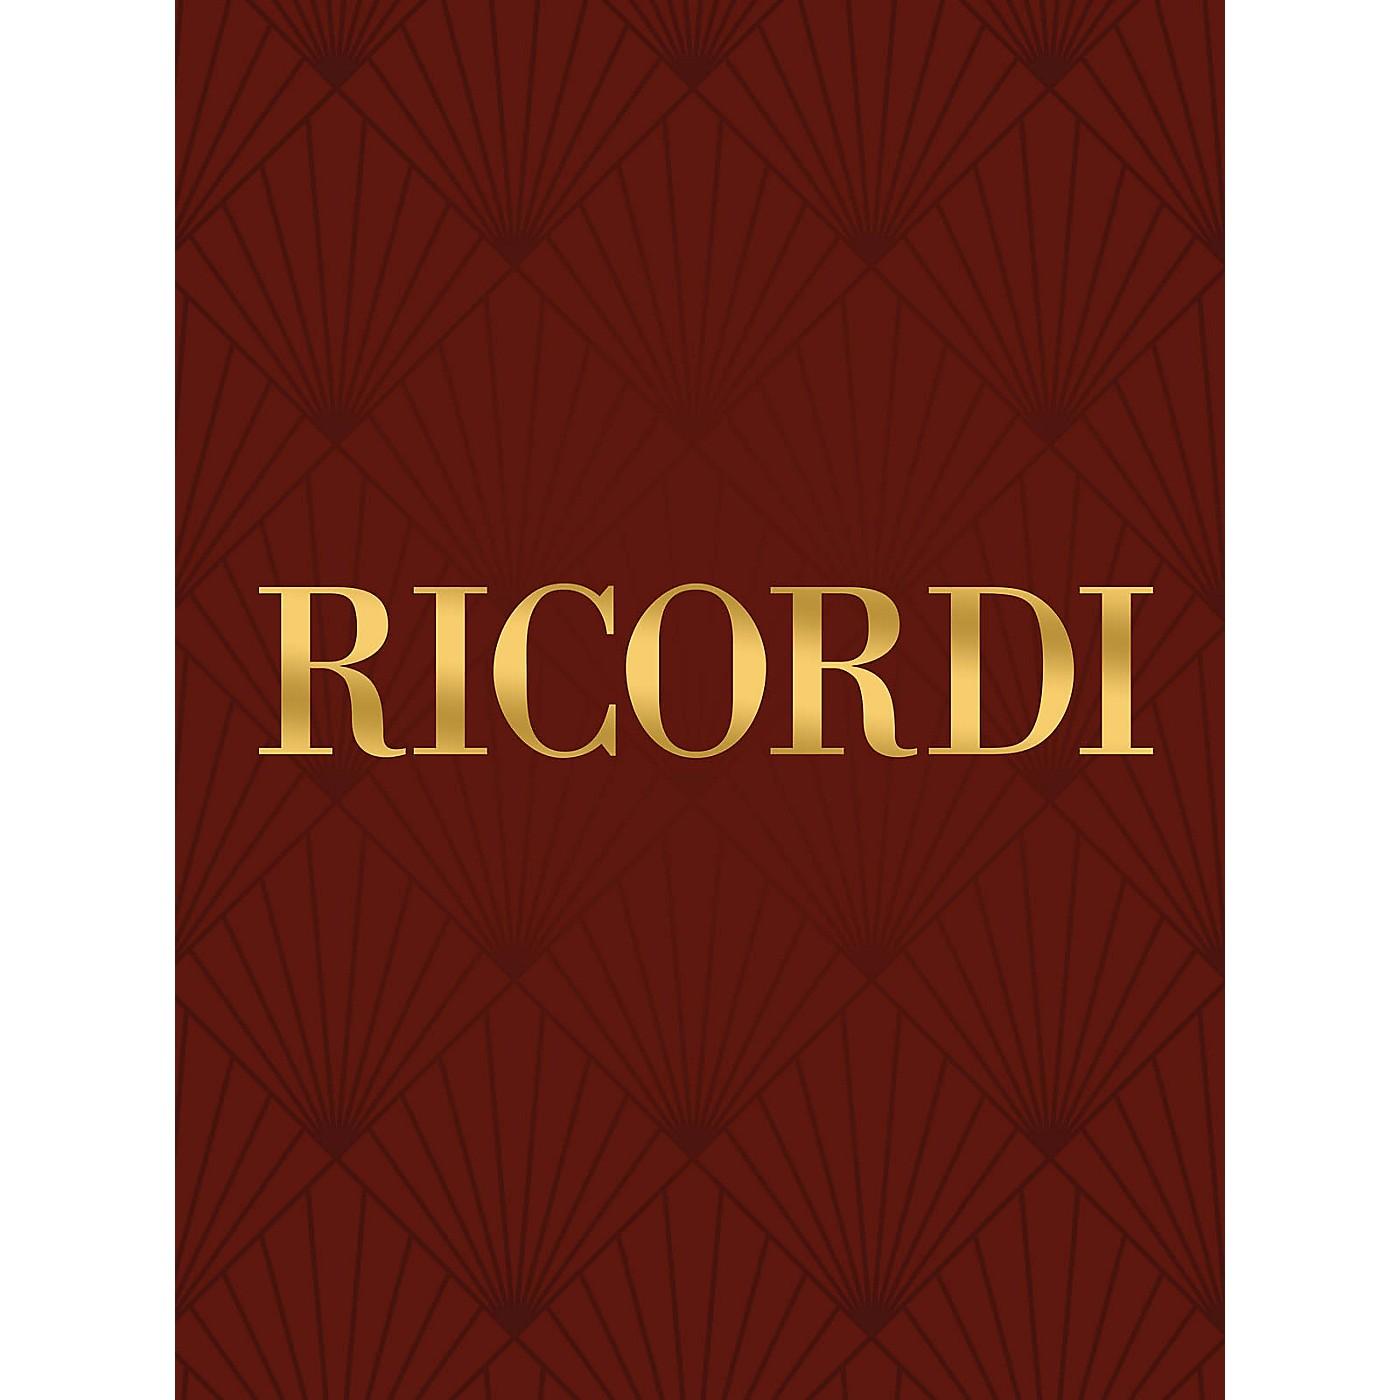 Ricordi Sonata in A Minor for Flute Bassoon and Basso Continuo RV86 by Vivaldi Edited by Gian Francesco Malipiero thumbnail